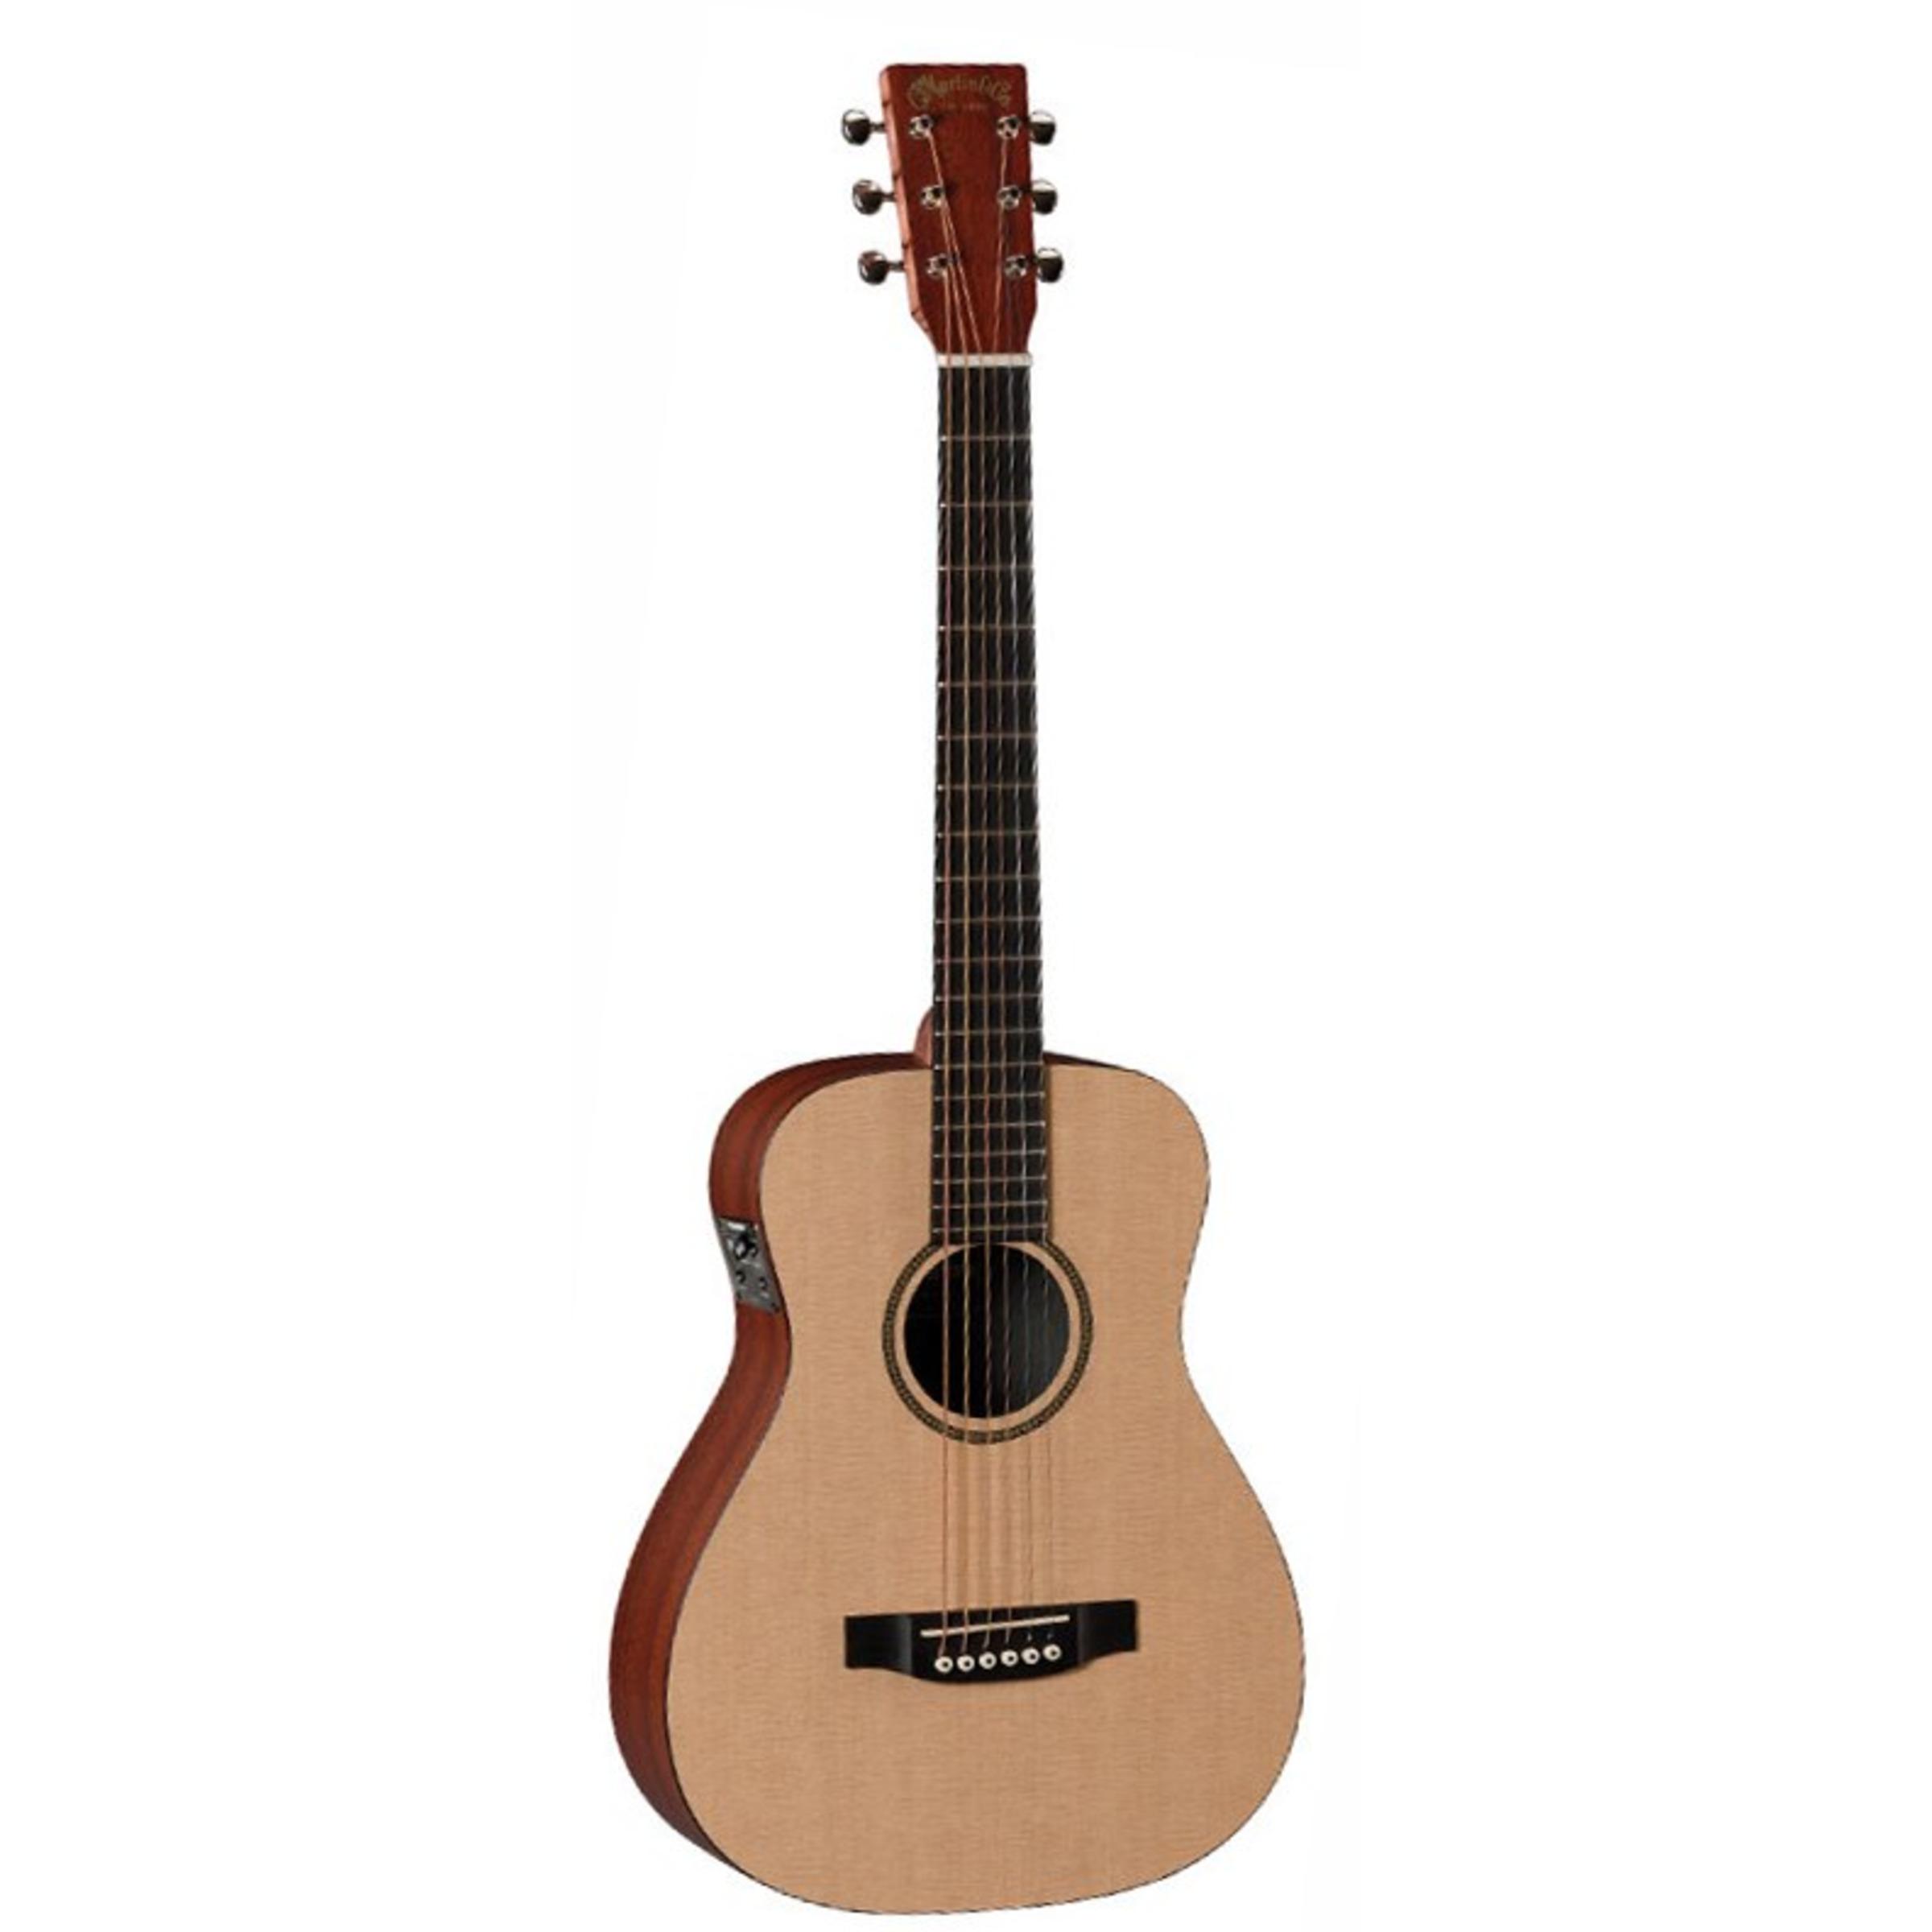 martin x series little martin electro acoustic guitar giggear. Black Bedroom Furniture Sets. Home Design Ideas